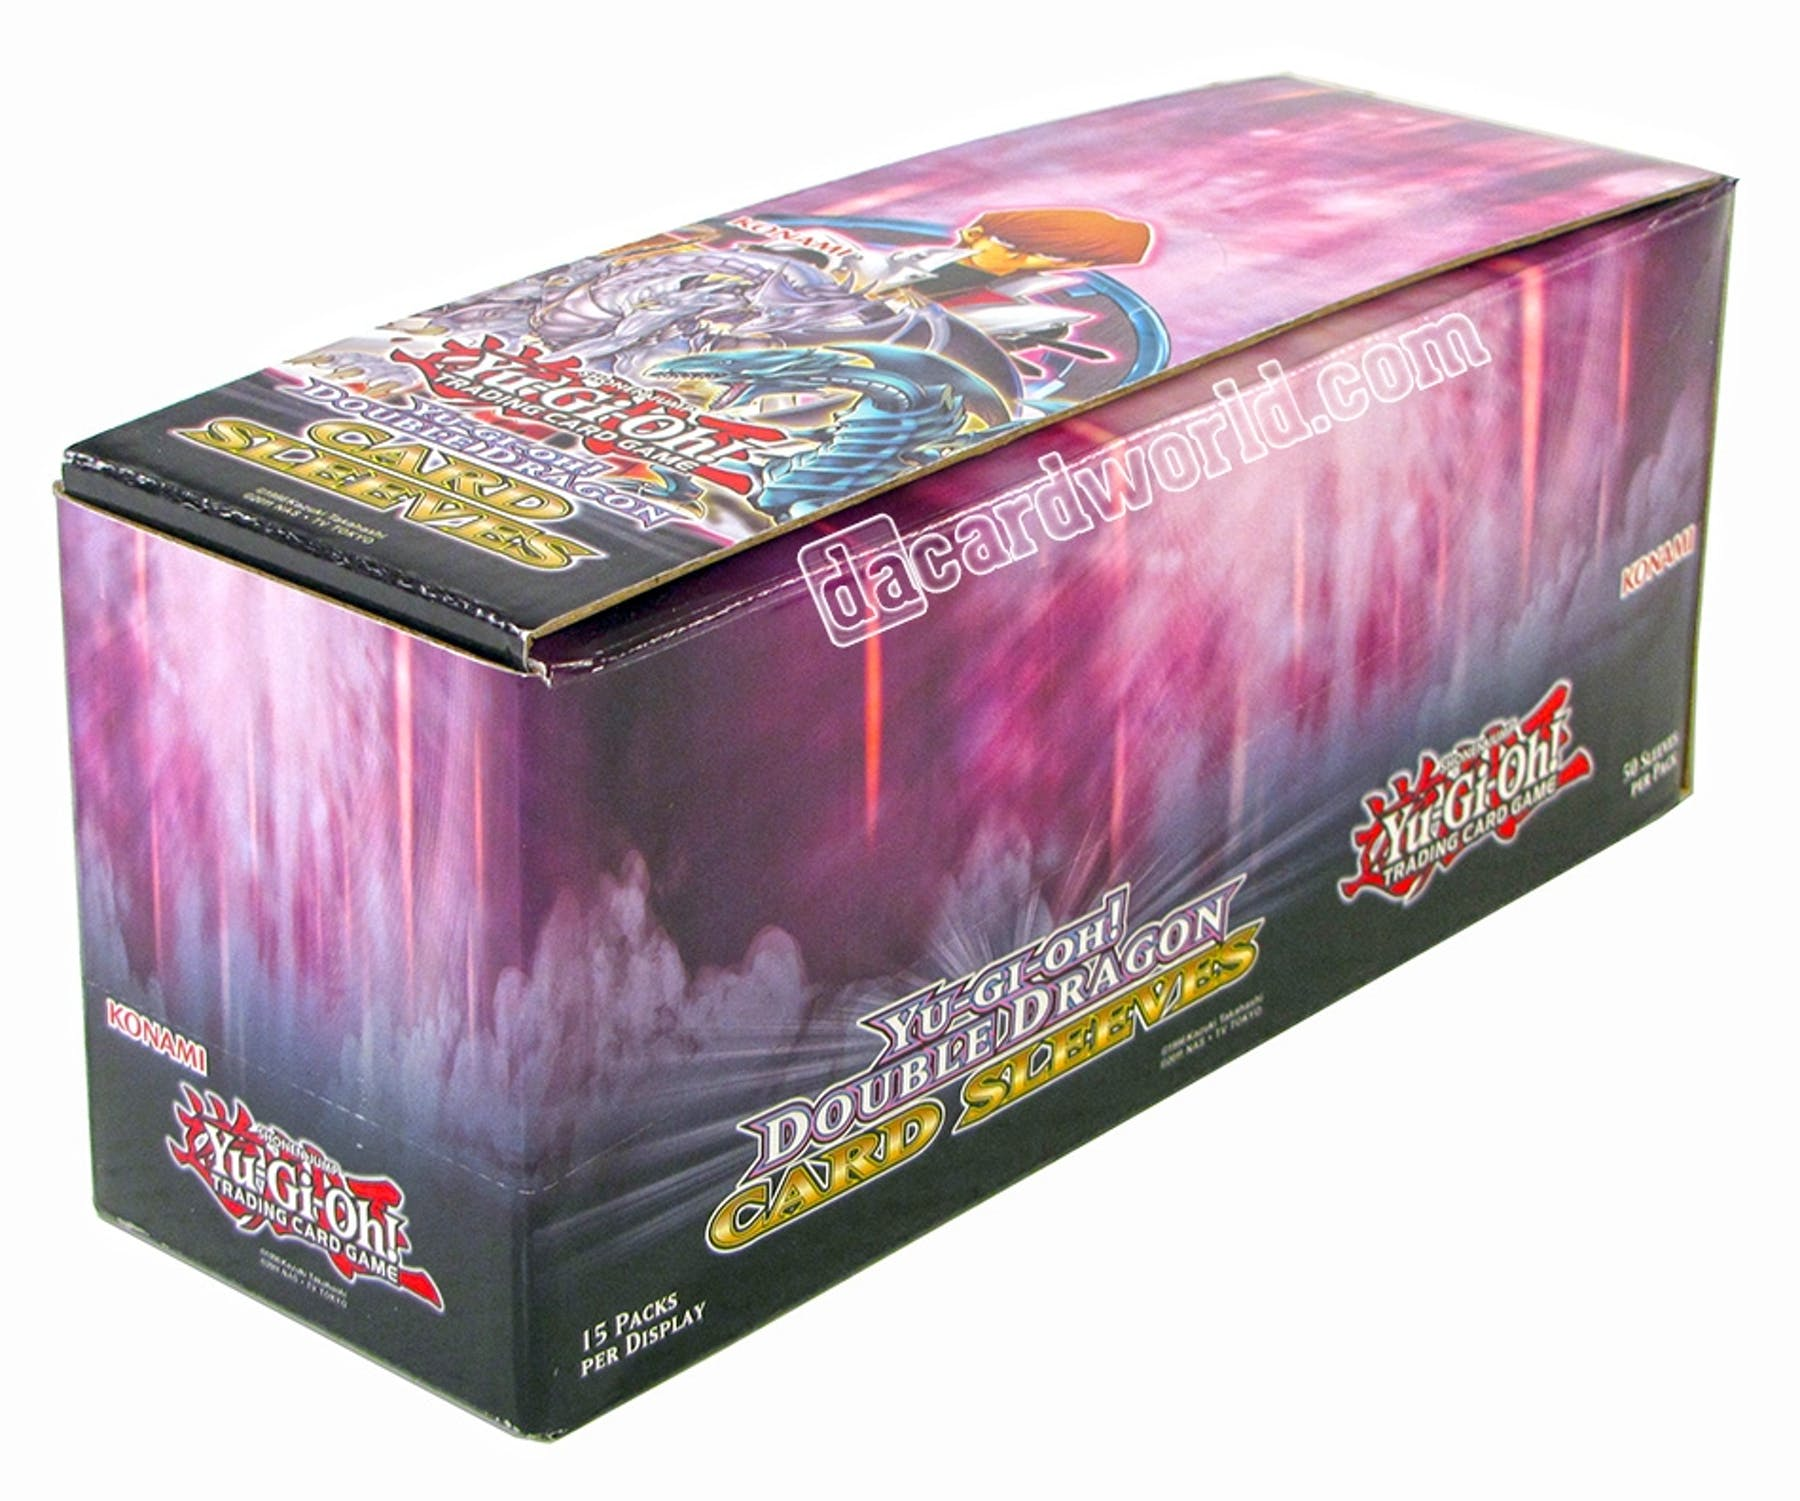 Konami Yu-Gi-Oh Double Dragon Card Sleeves Box Of 15 Packs